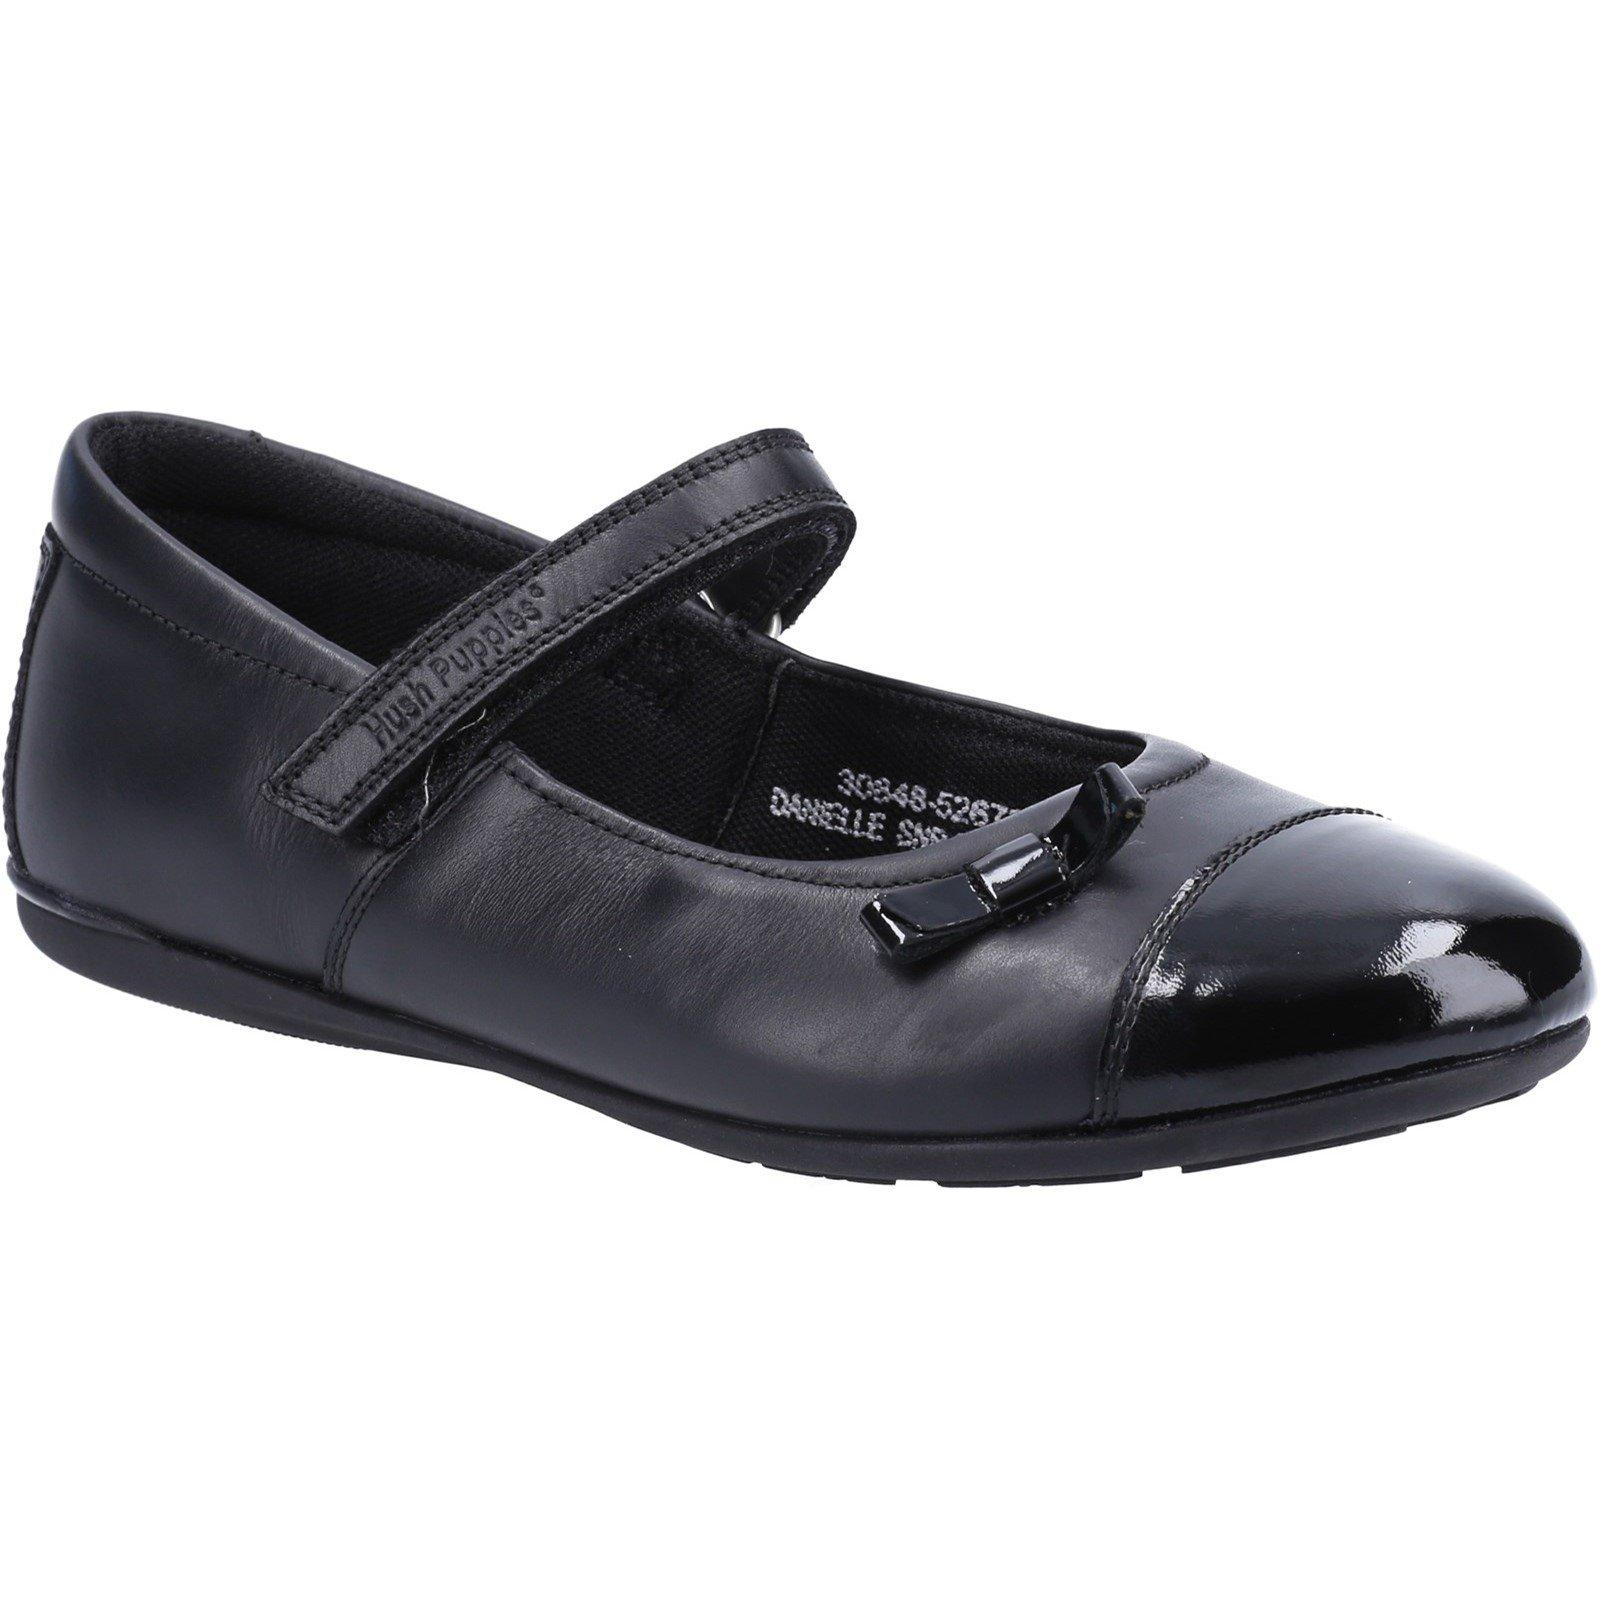 Hush Puppies Kid's Danielle Junior School Shoe Black 30847 - Black 2